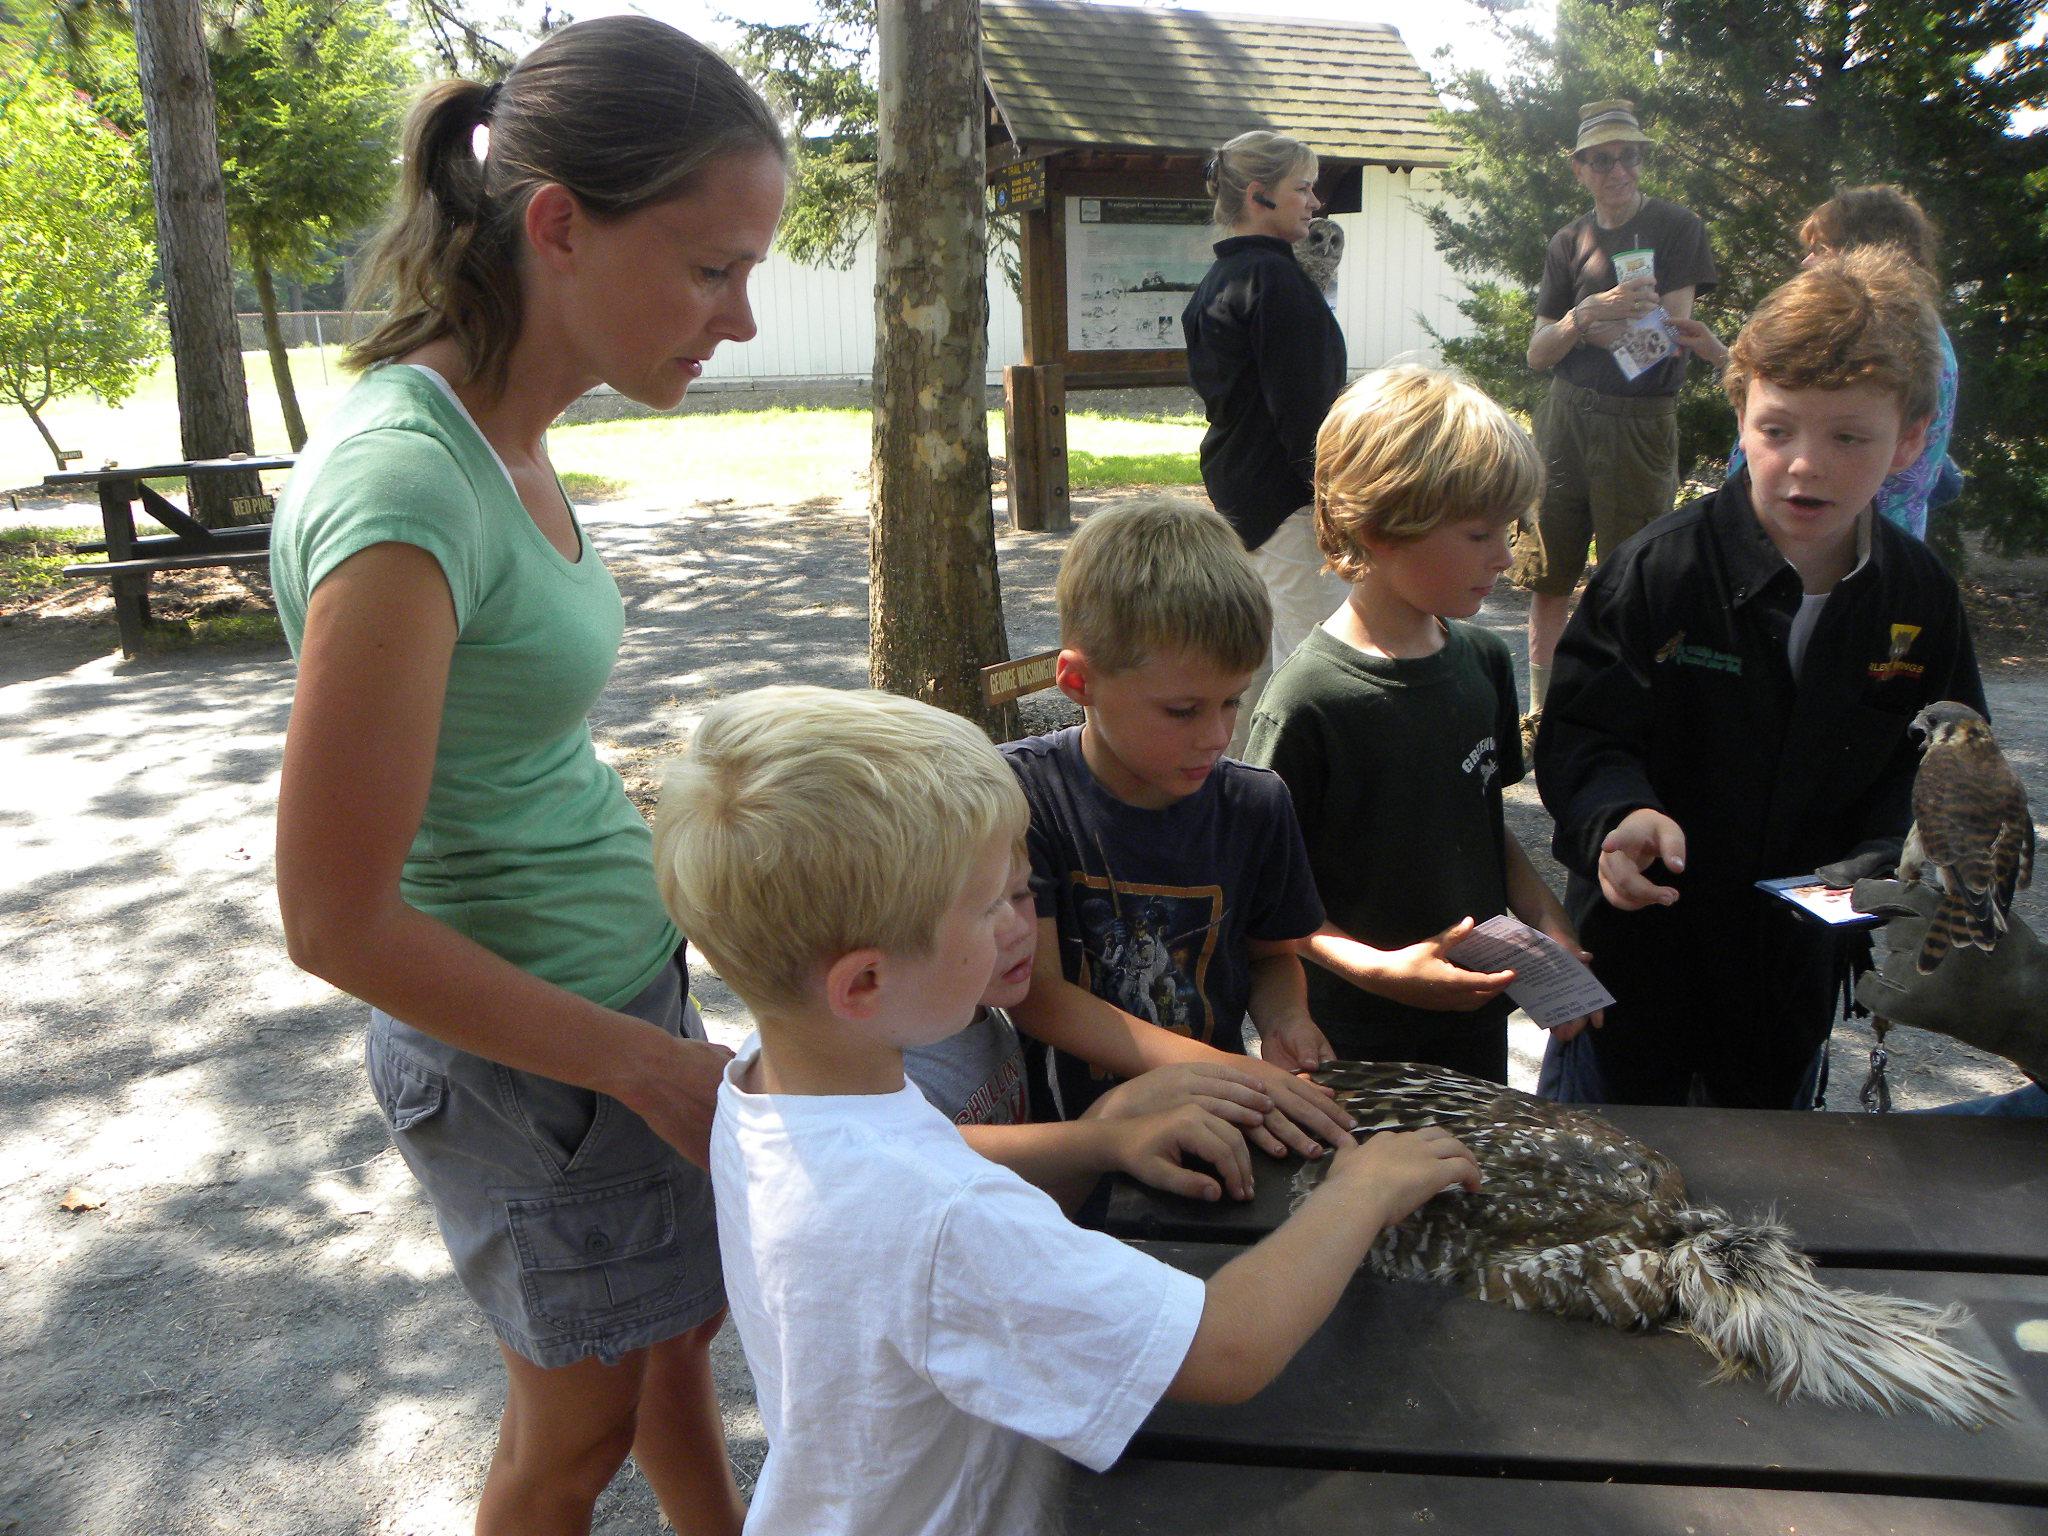 Beren educating kids at washington cty fair